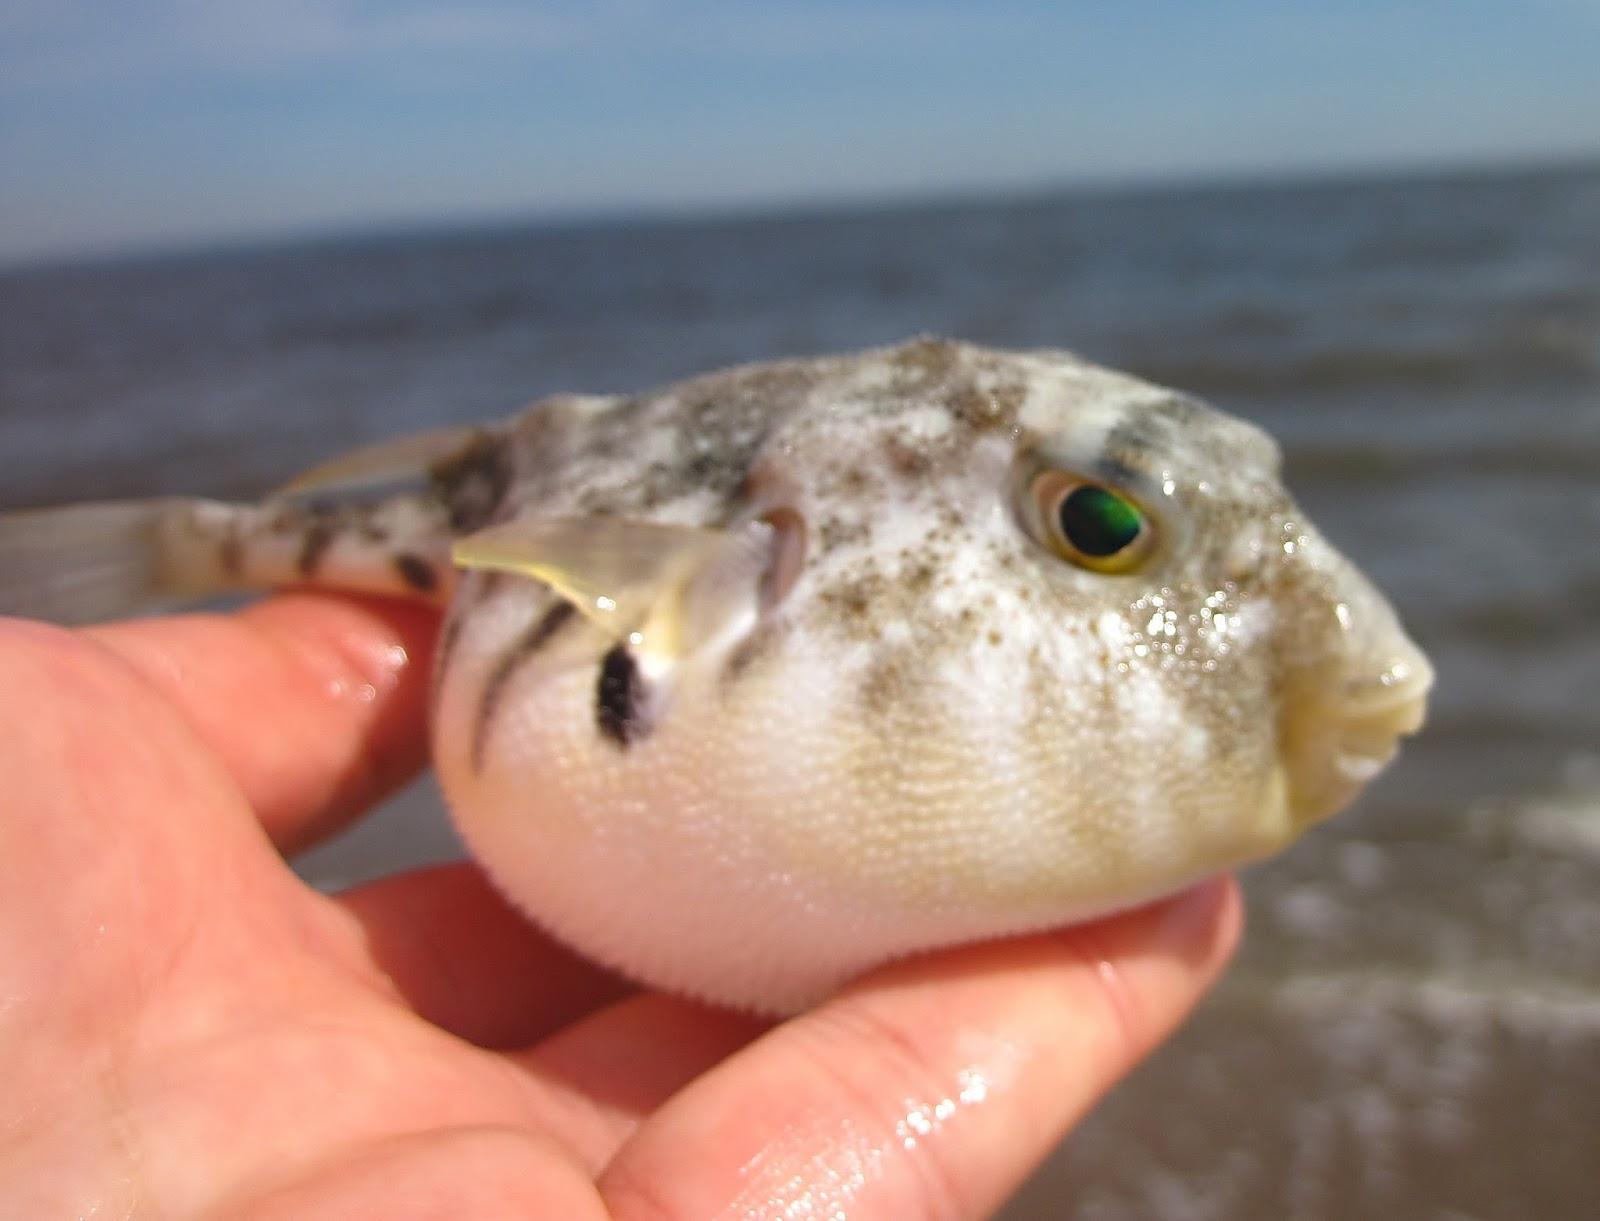 giant puffer fish puffed up - photo #11